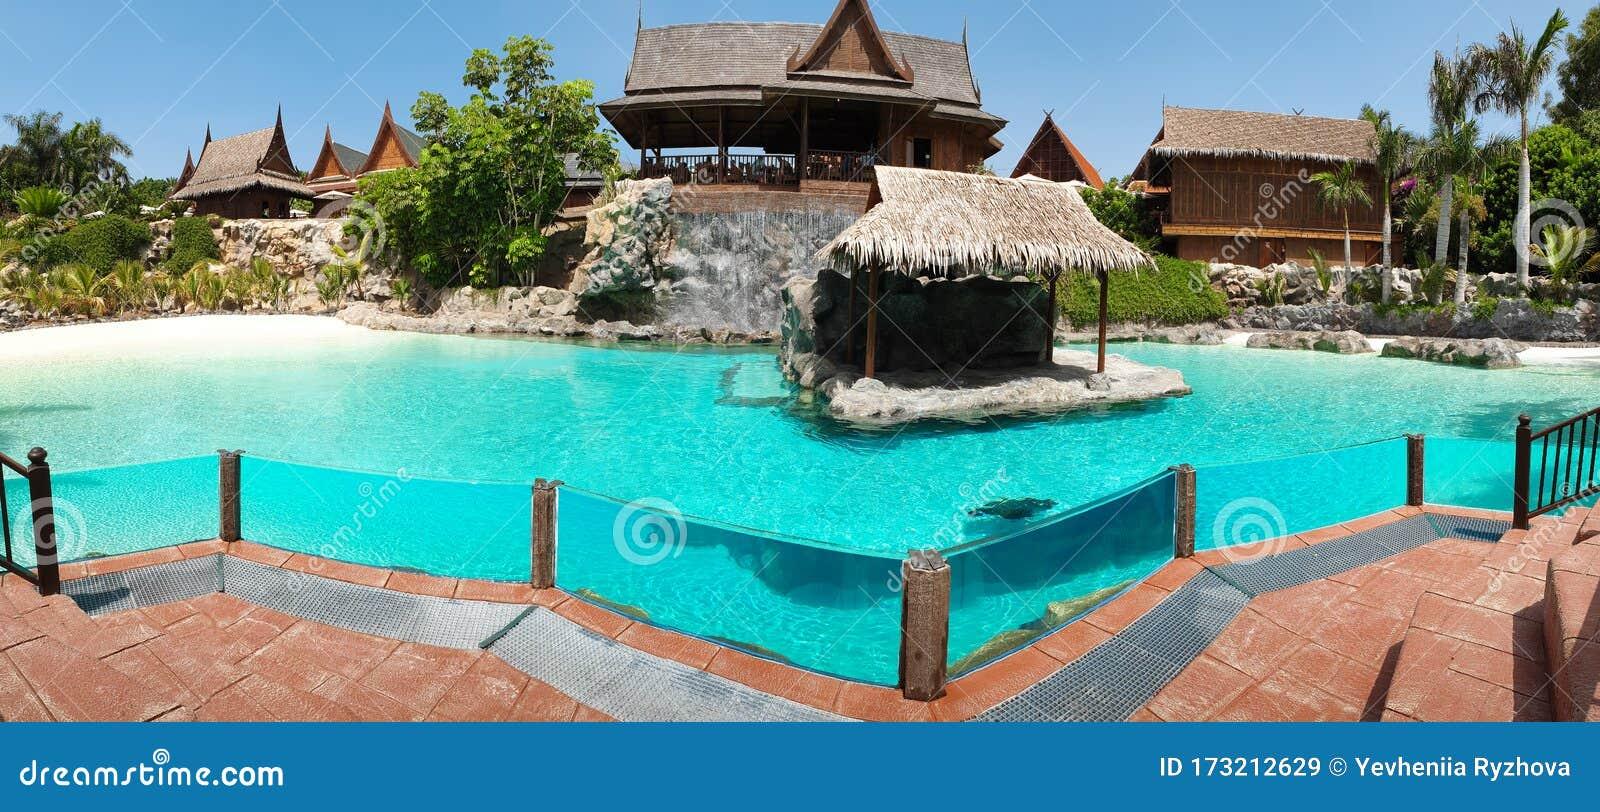 Beautiful Panoramic Photo Of Swimming Pool At The Luxurious Villa